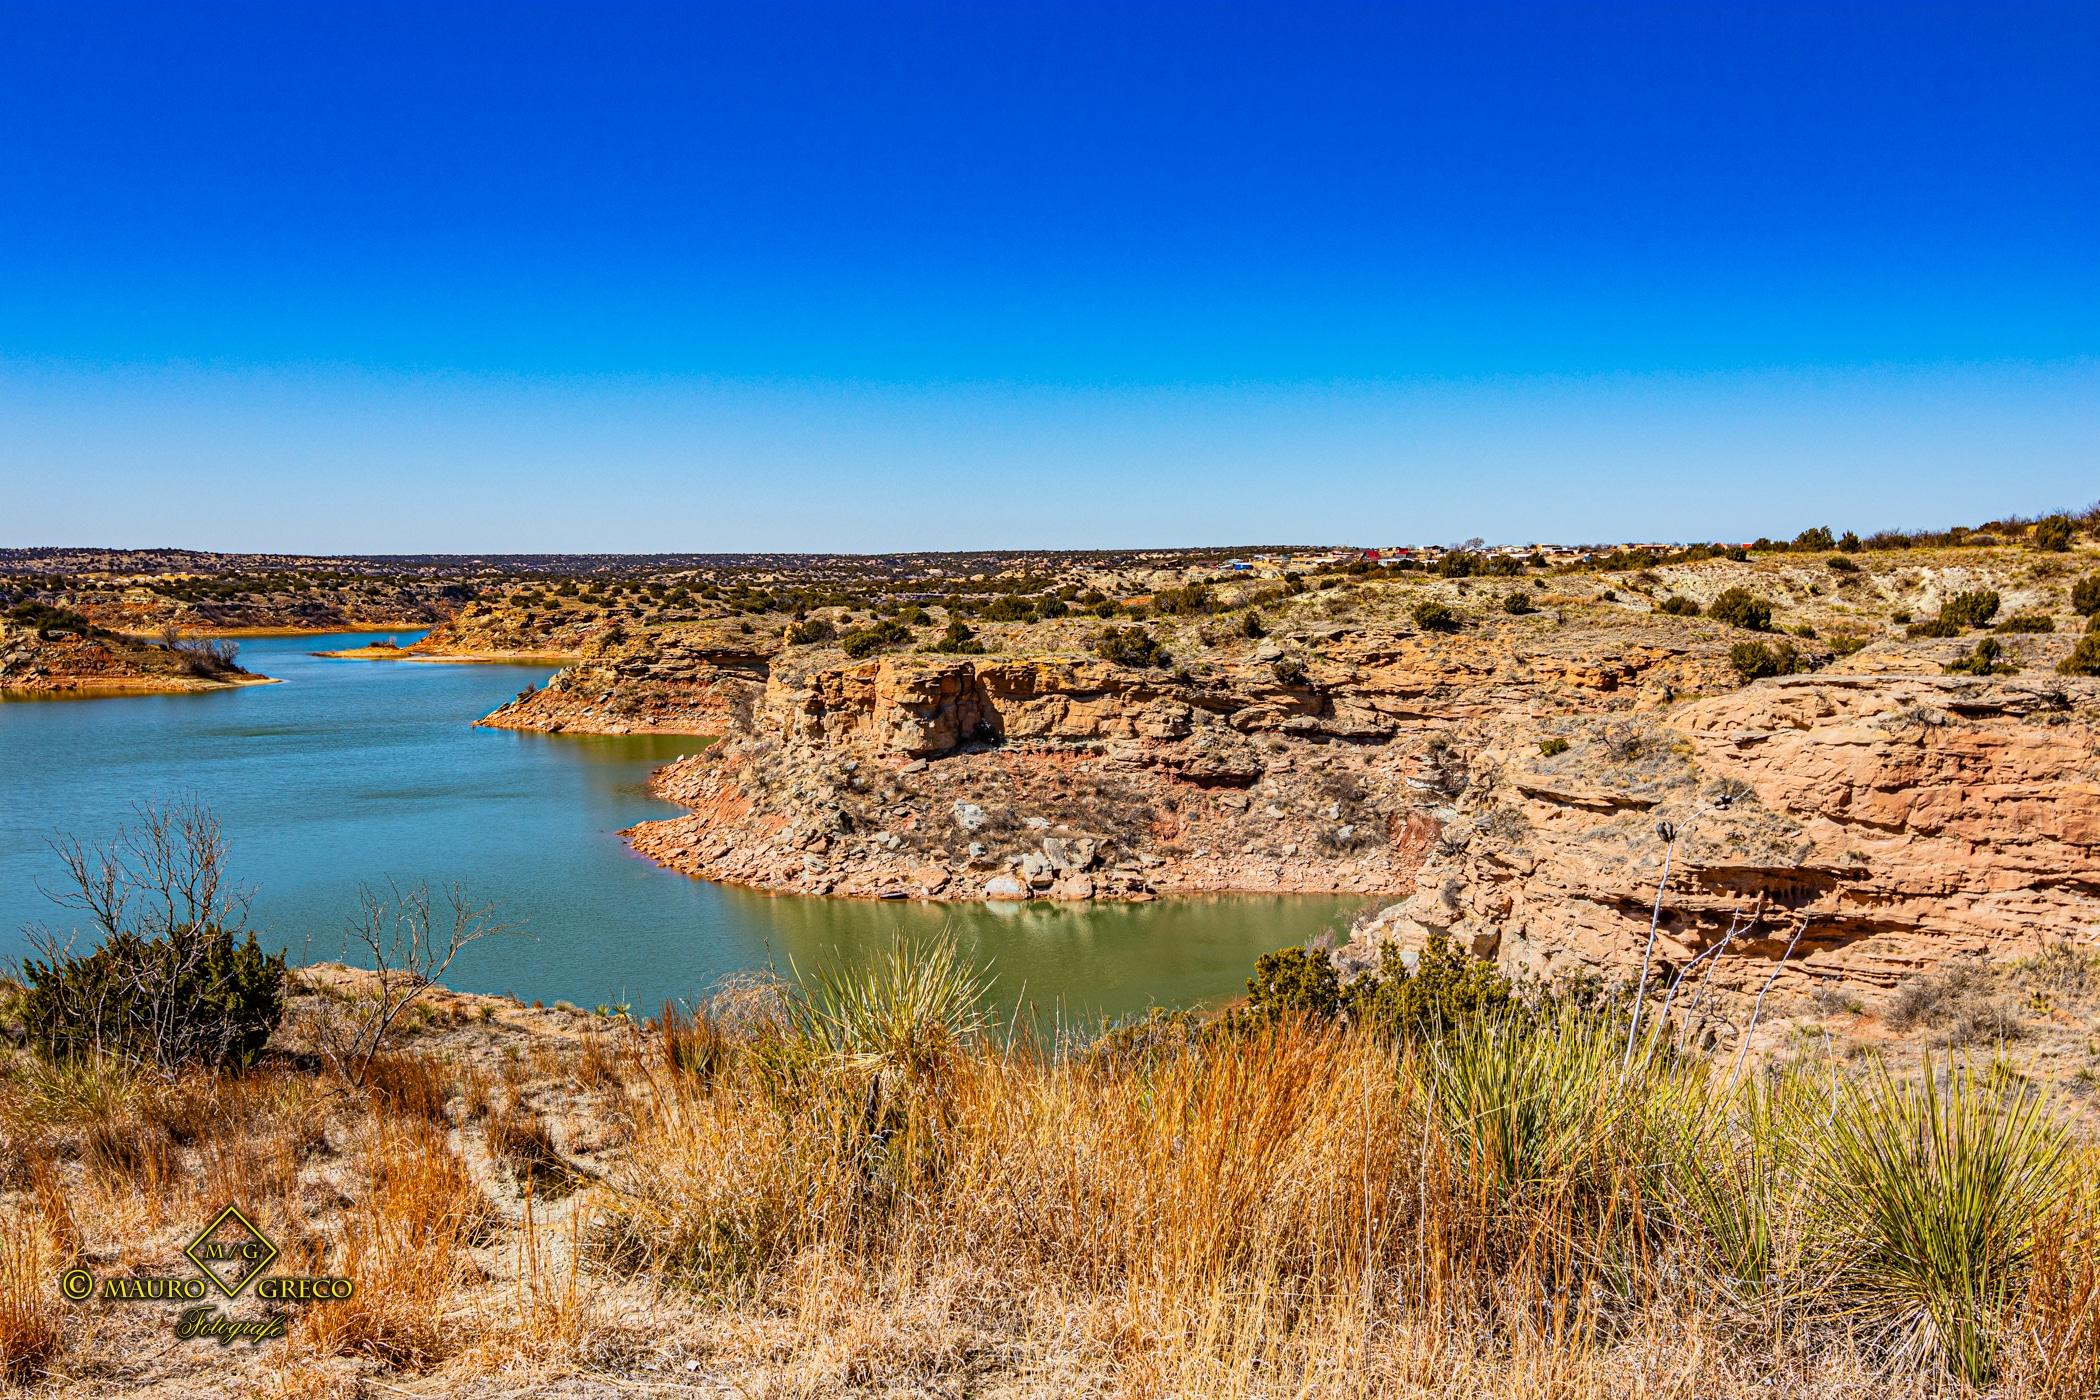 Texas 2020 Tornado Moto Tour Viaggi organizzati in moto negli USA Monument Valley